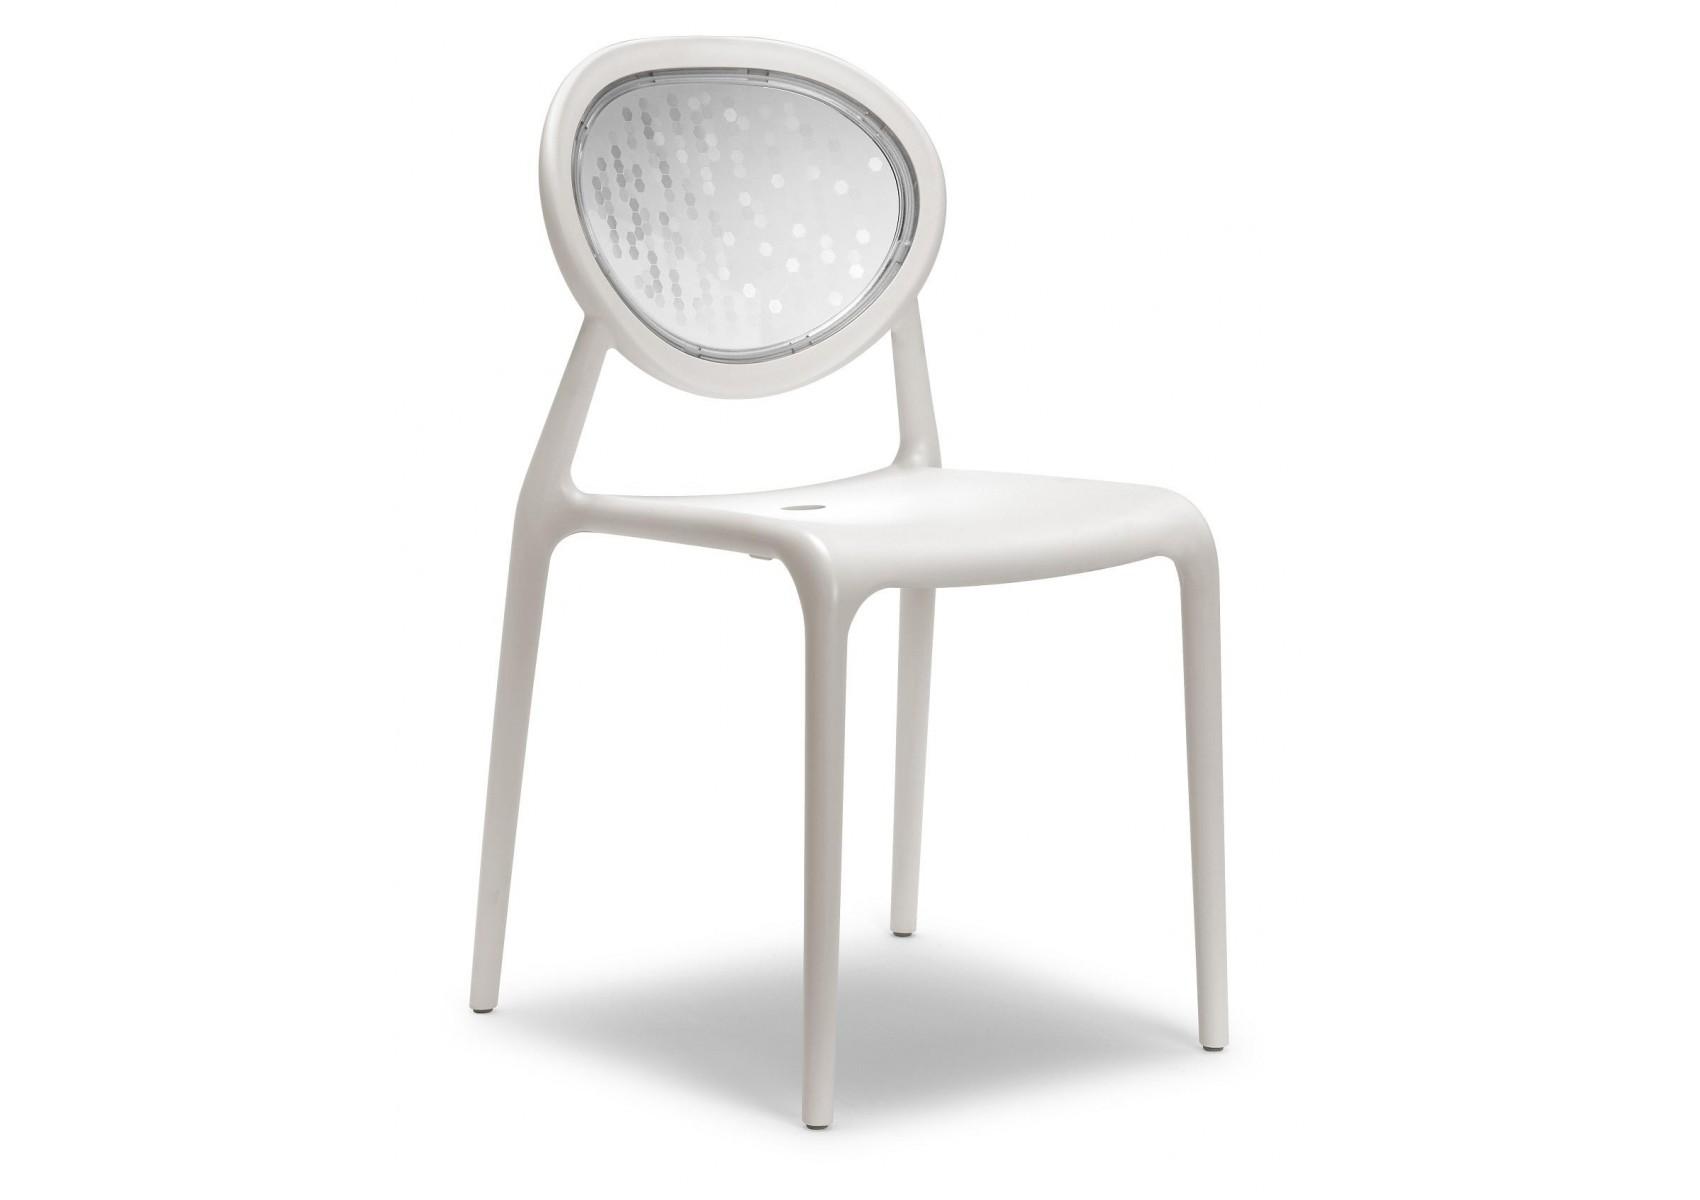 3 chaises design super gio par scab design. Black Bedroom Furniture Sets. Home Design Ideas